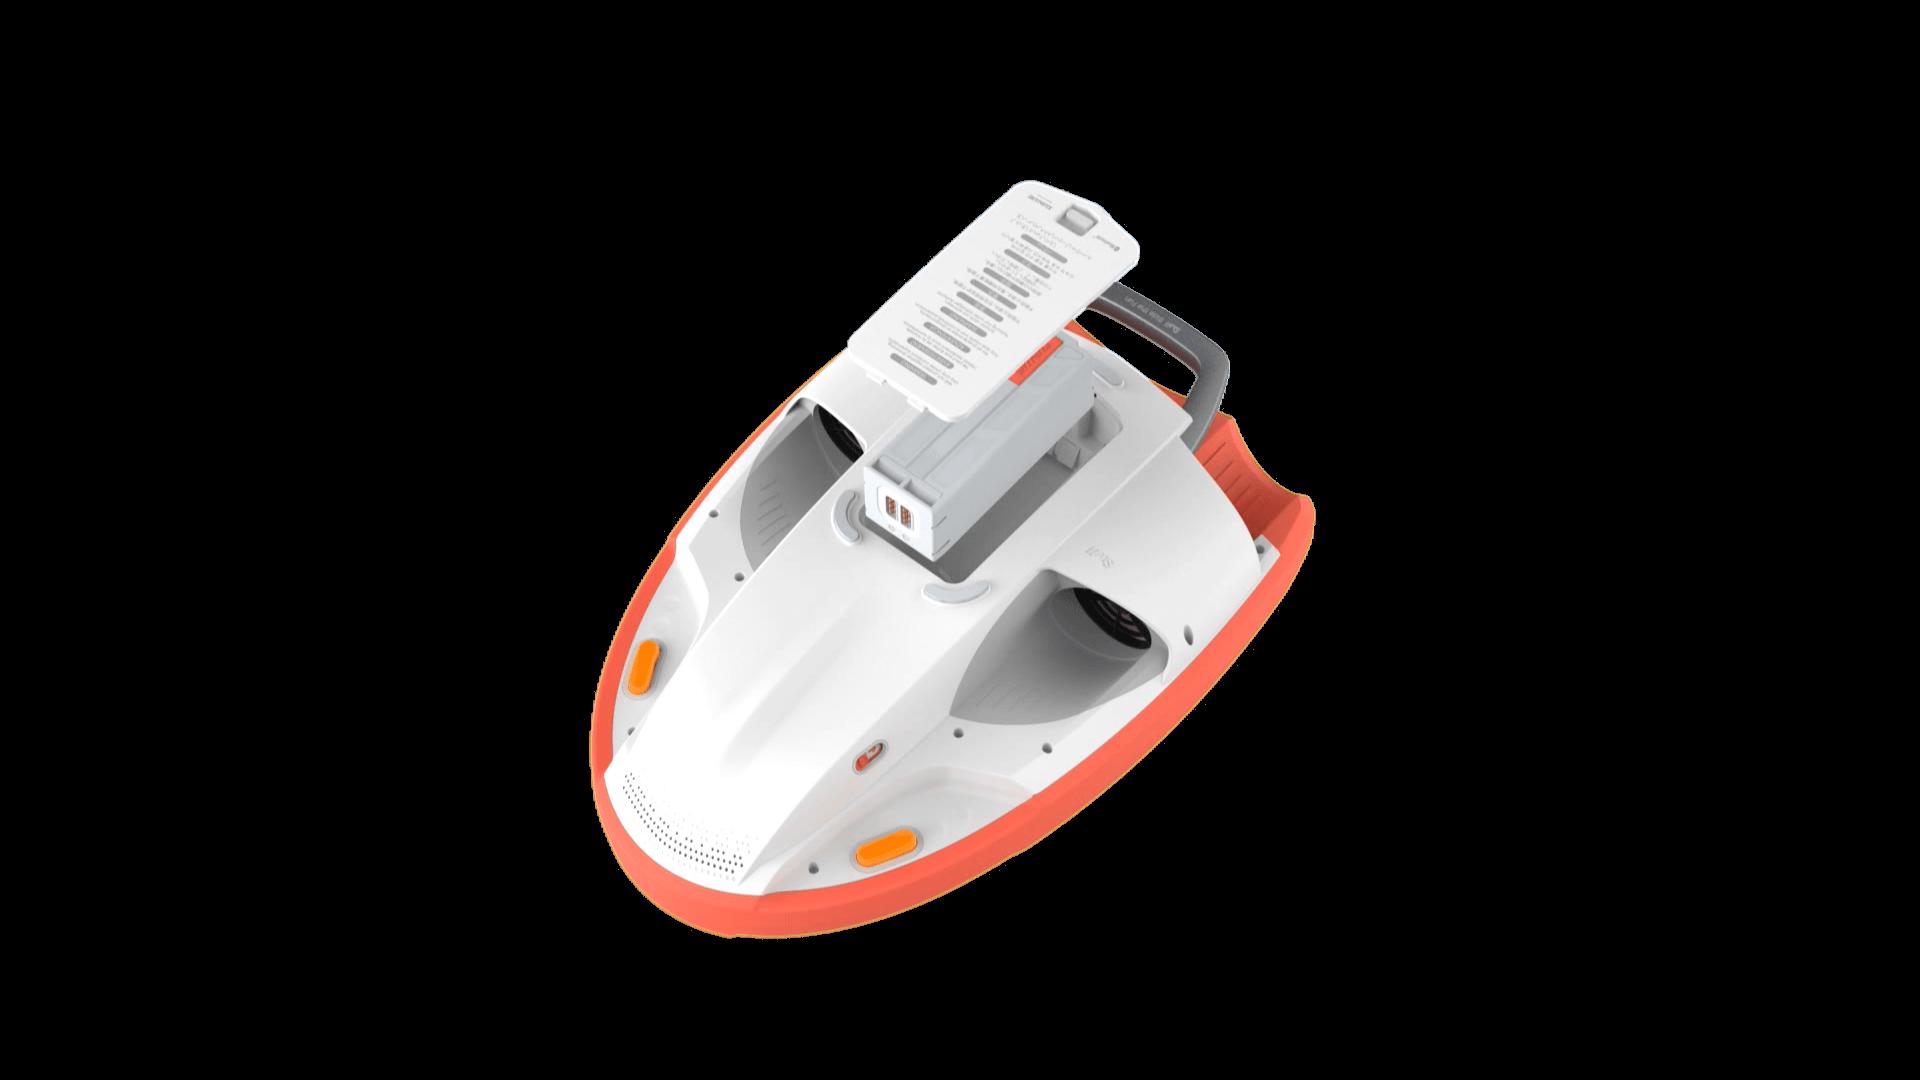 Электрический подводный скутер Sublue Swii 98Wh Orange